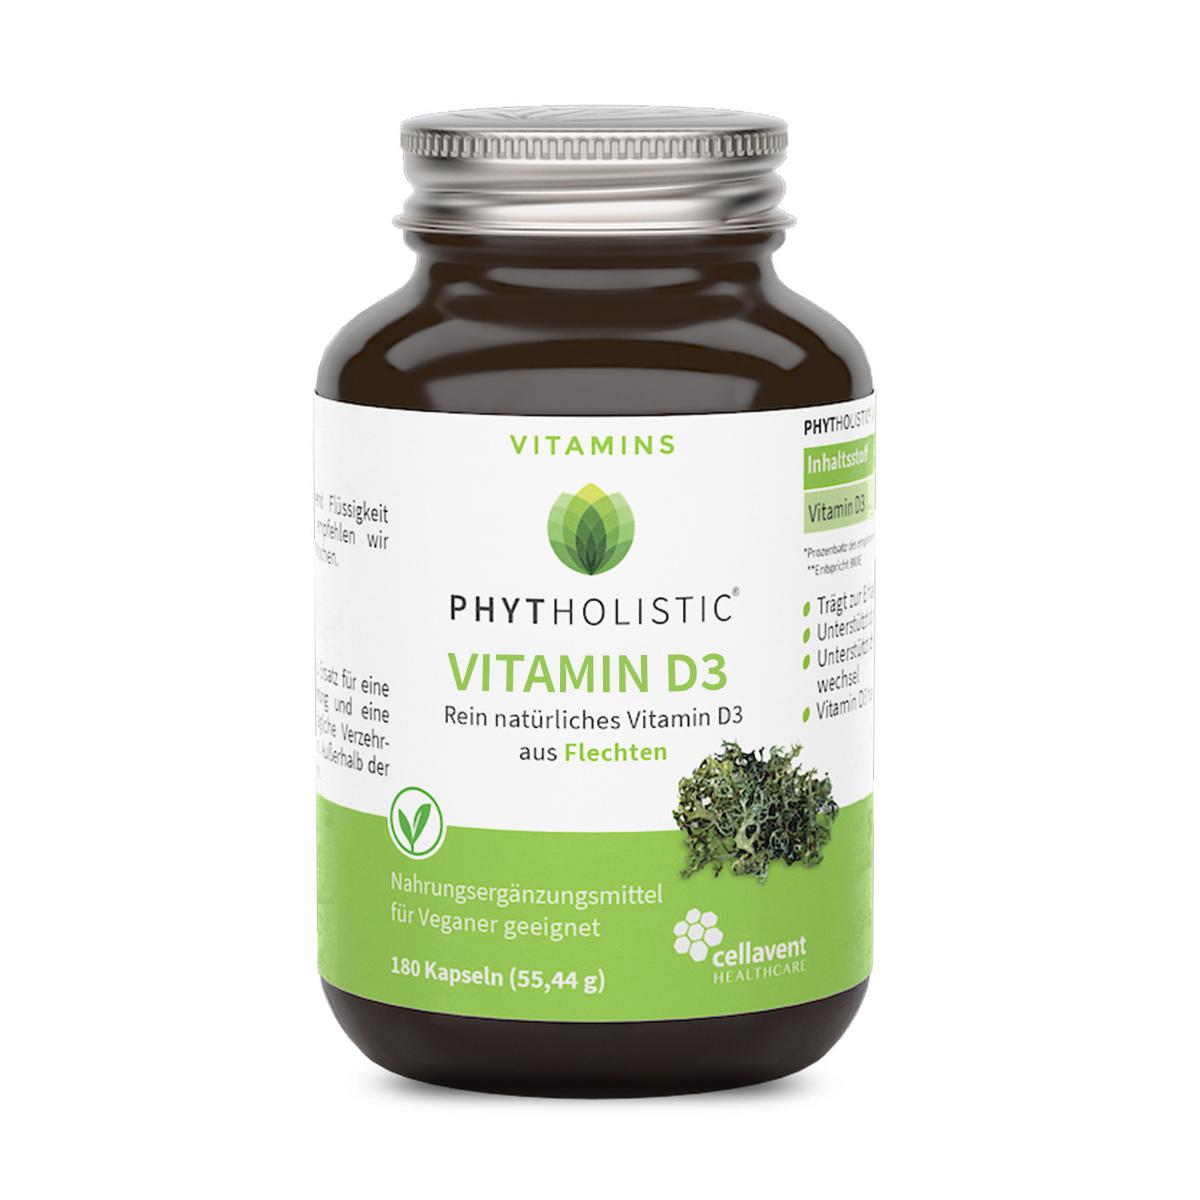 vitamin-d3-kapseln-vegan-phytholistic-180-stueck-glas-vorne-1200×1200